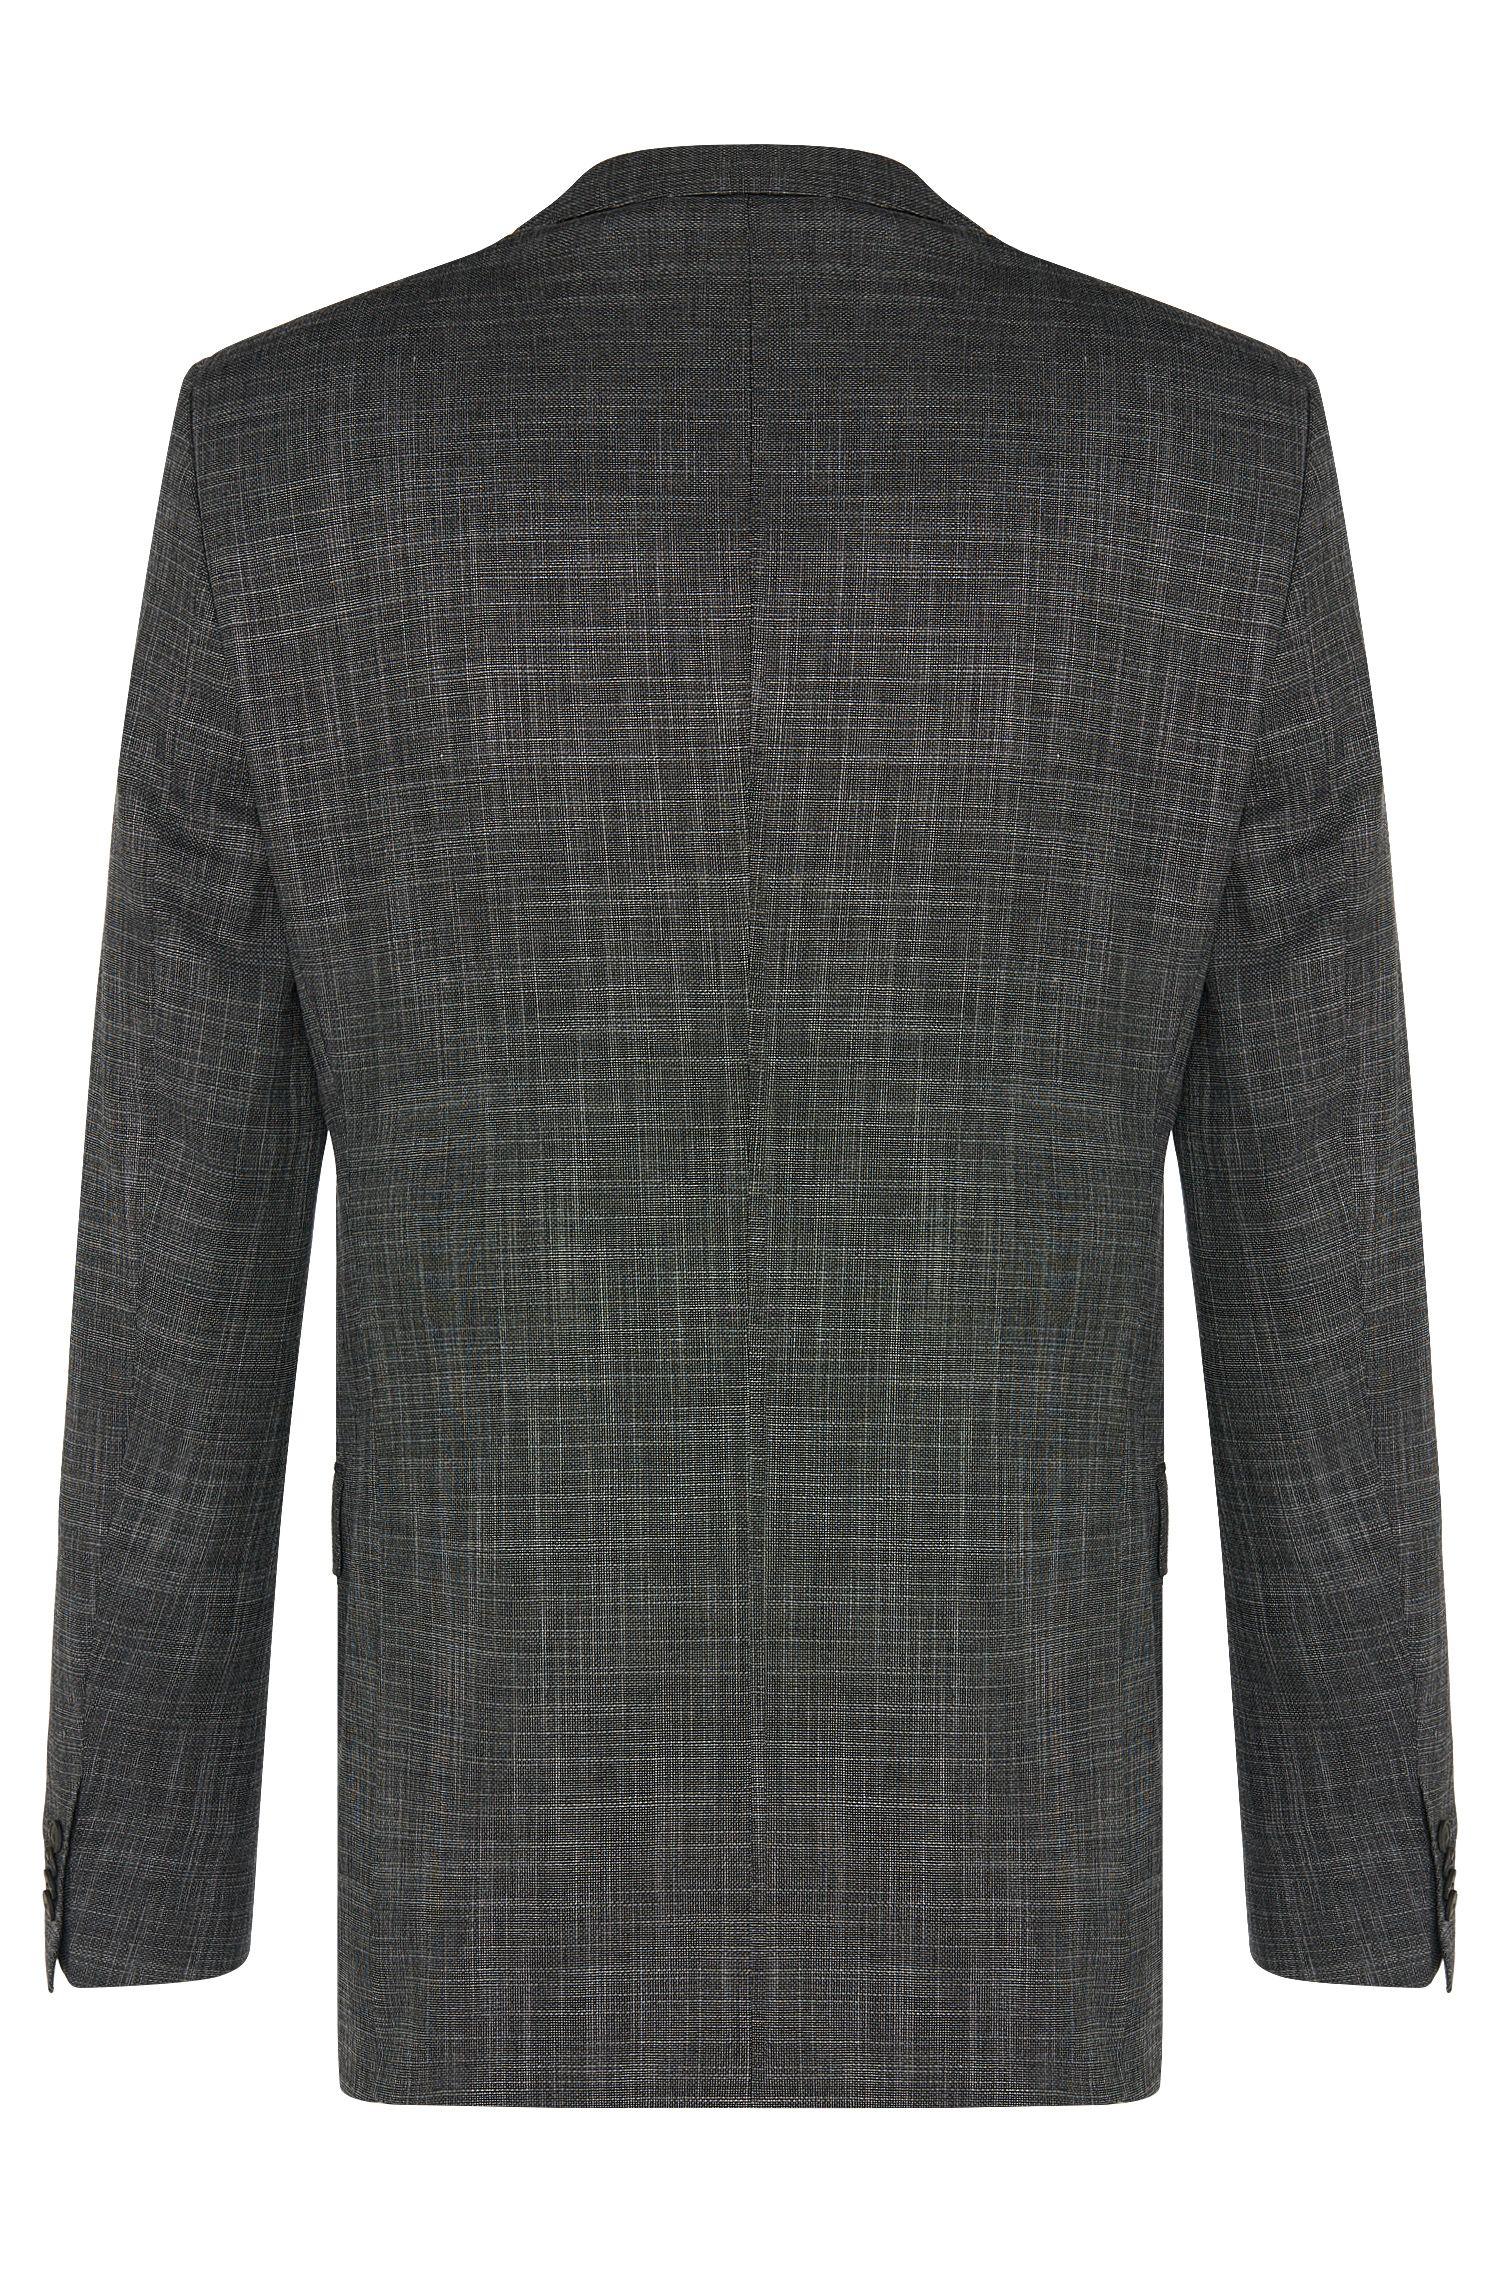 Stretch Wool Blend 3-Piece Suit, Slim Fit   Hutson/Gander WE